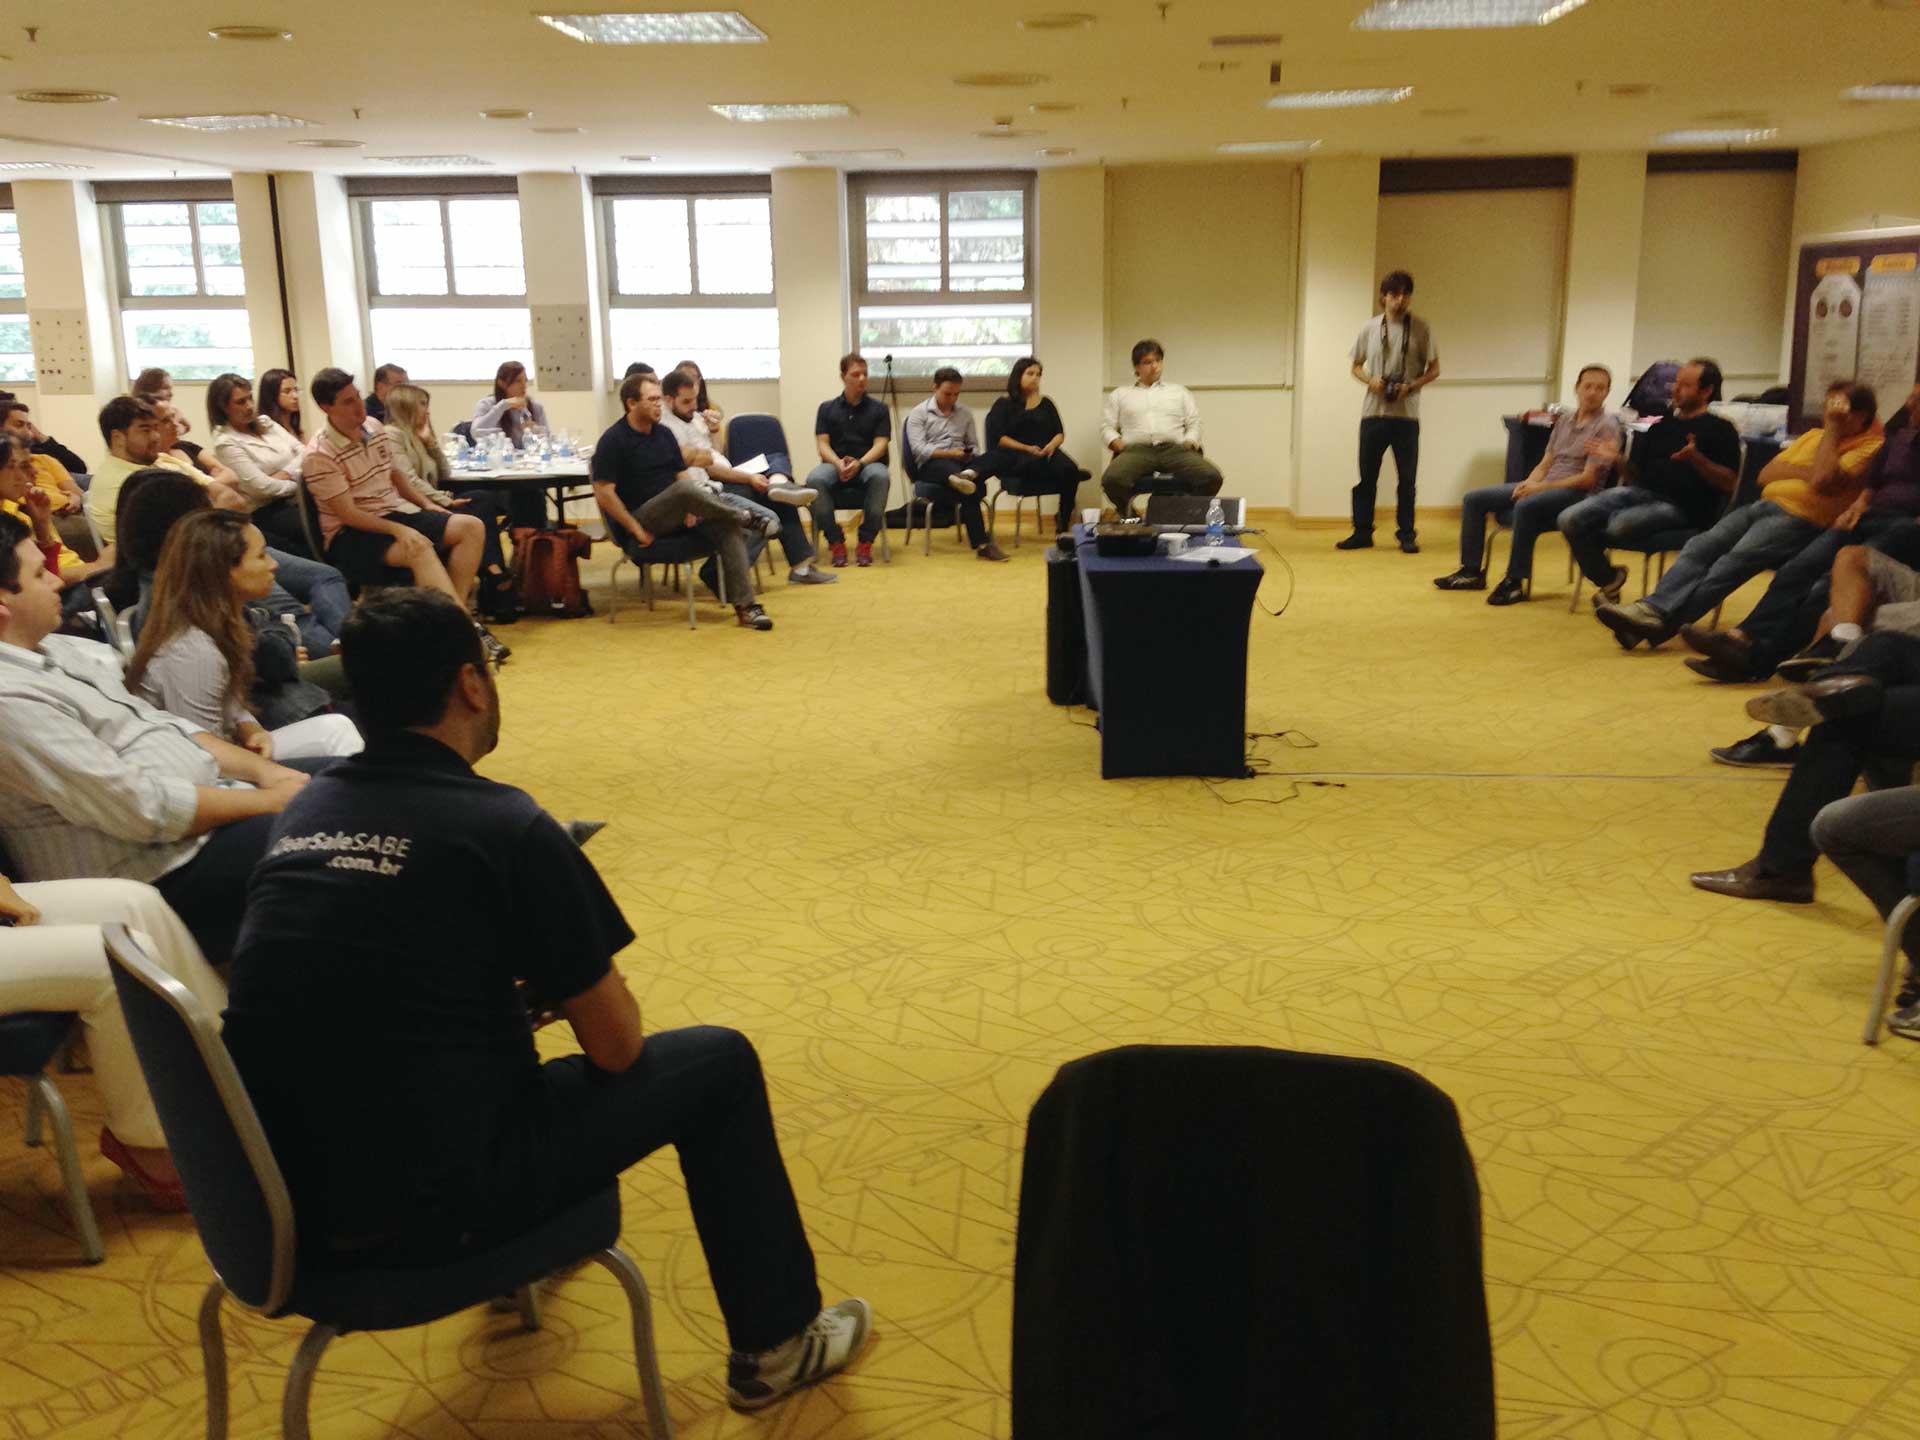 Reunião de líderes na Clearsale